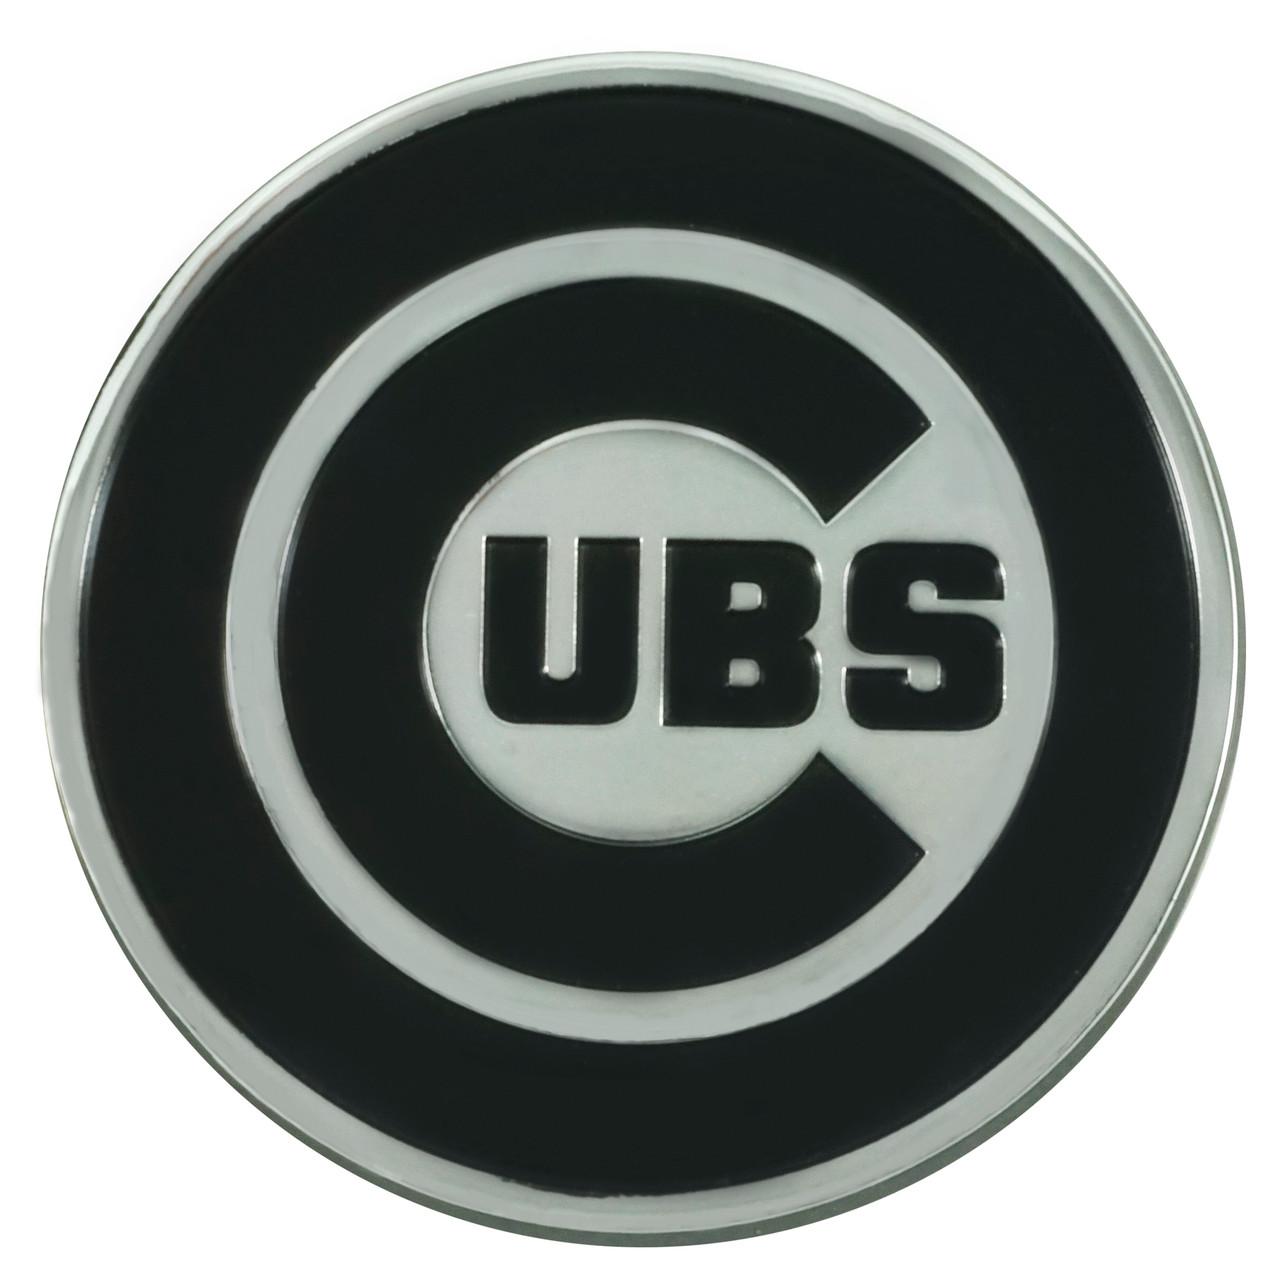 Chicago Cubs Auto Emblem Premium Metal Chrome